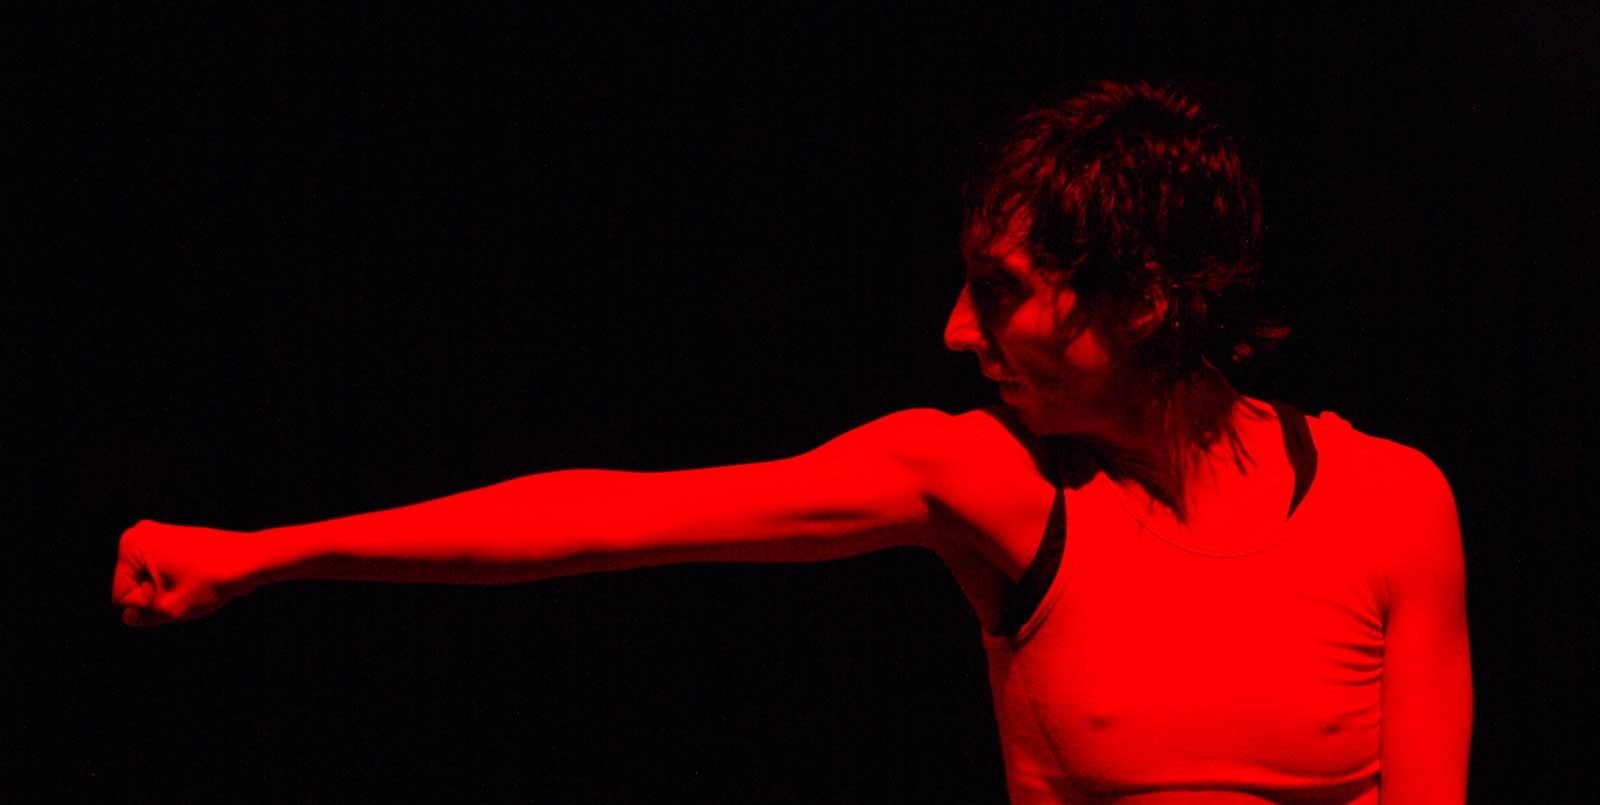 Acusmatrix, danza